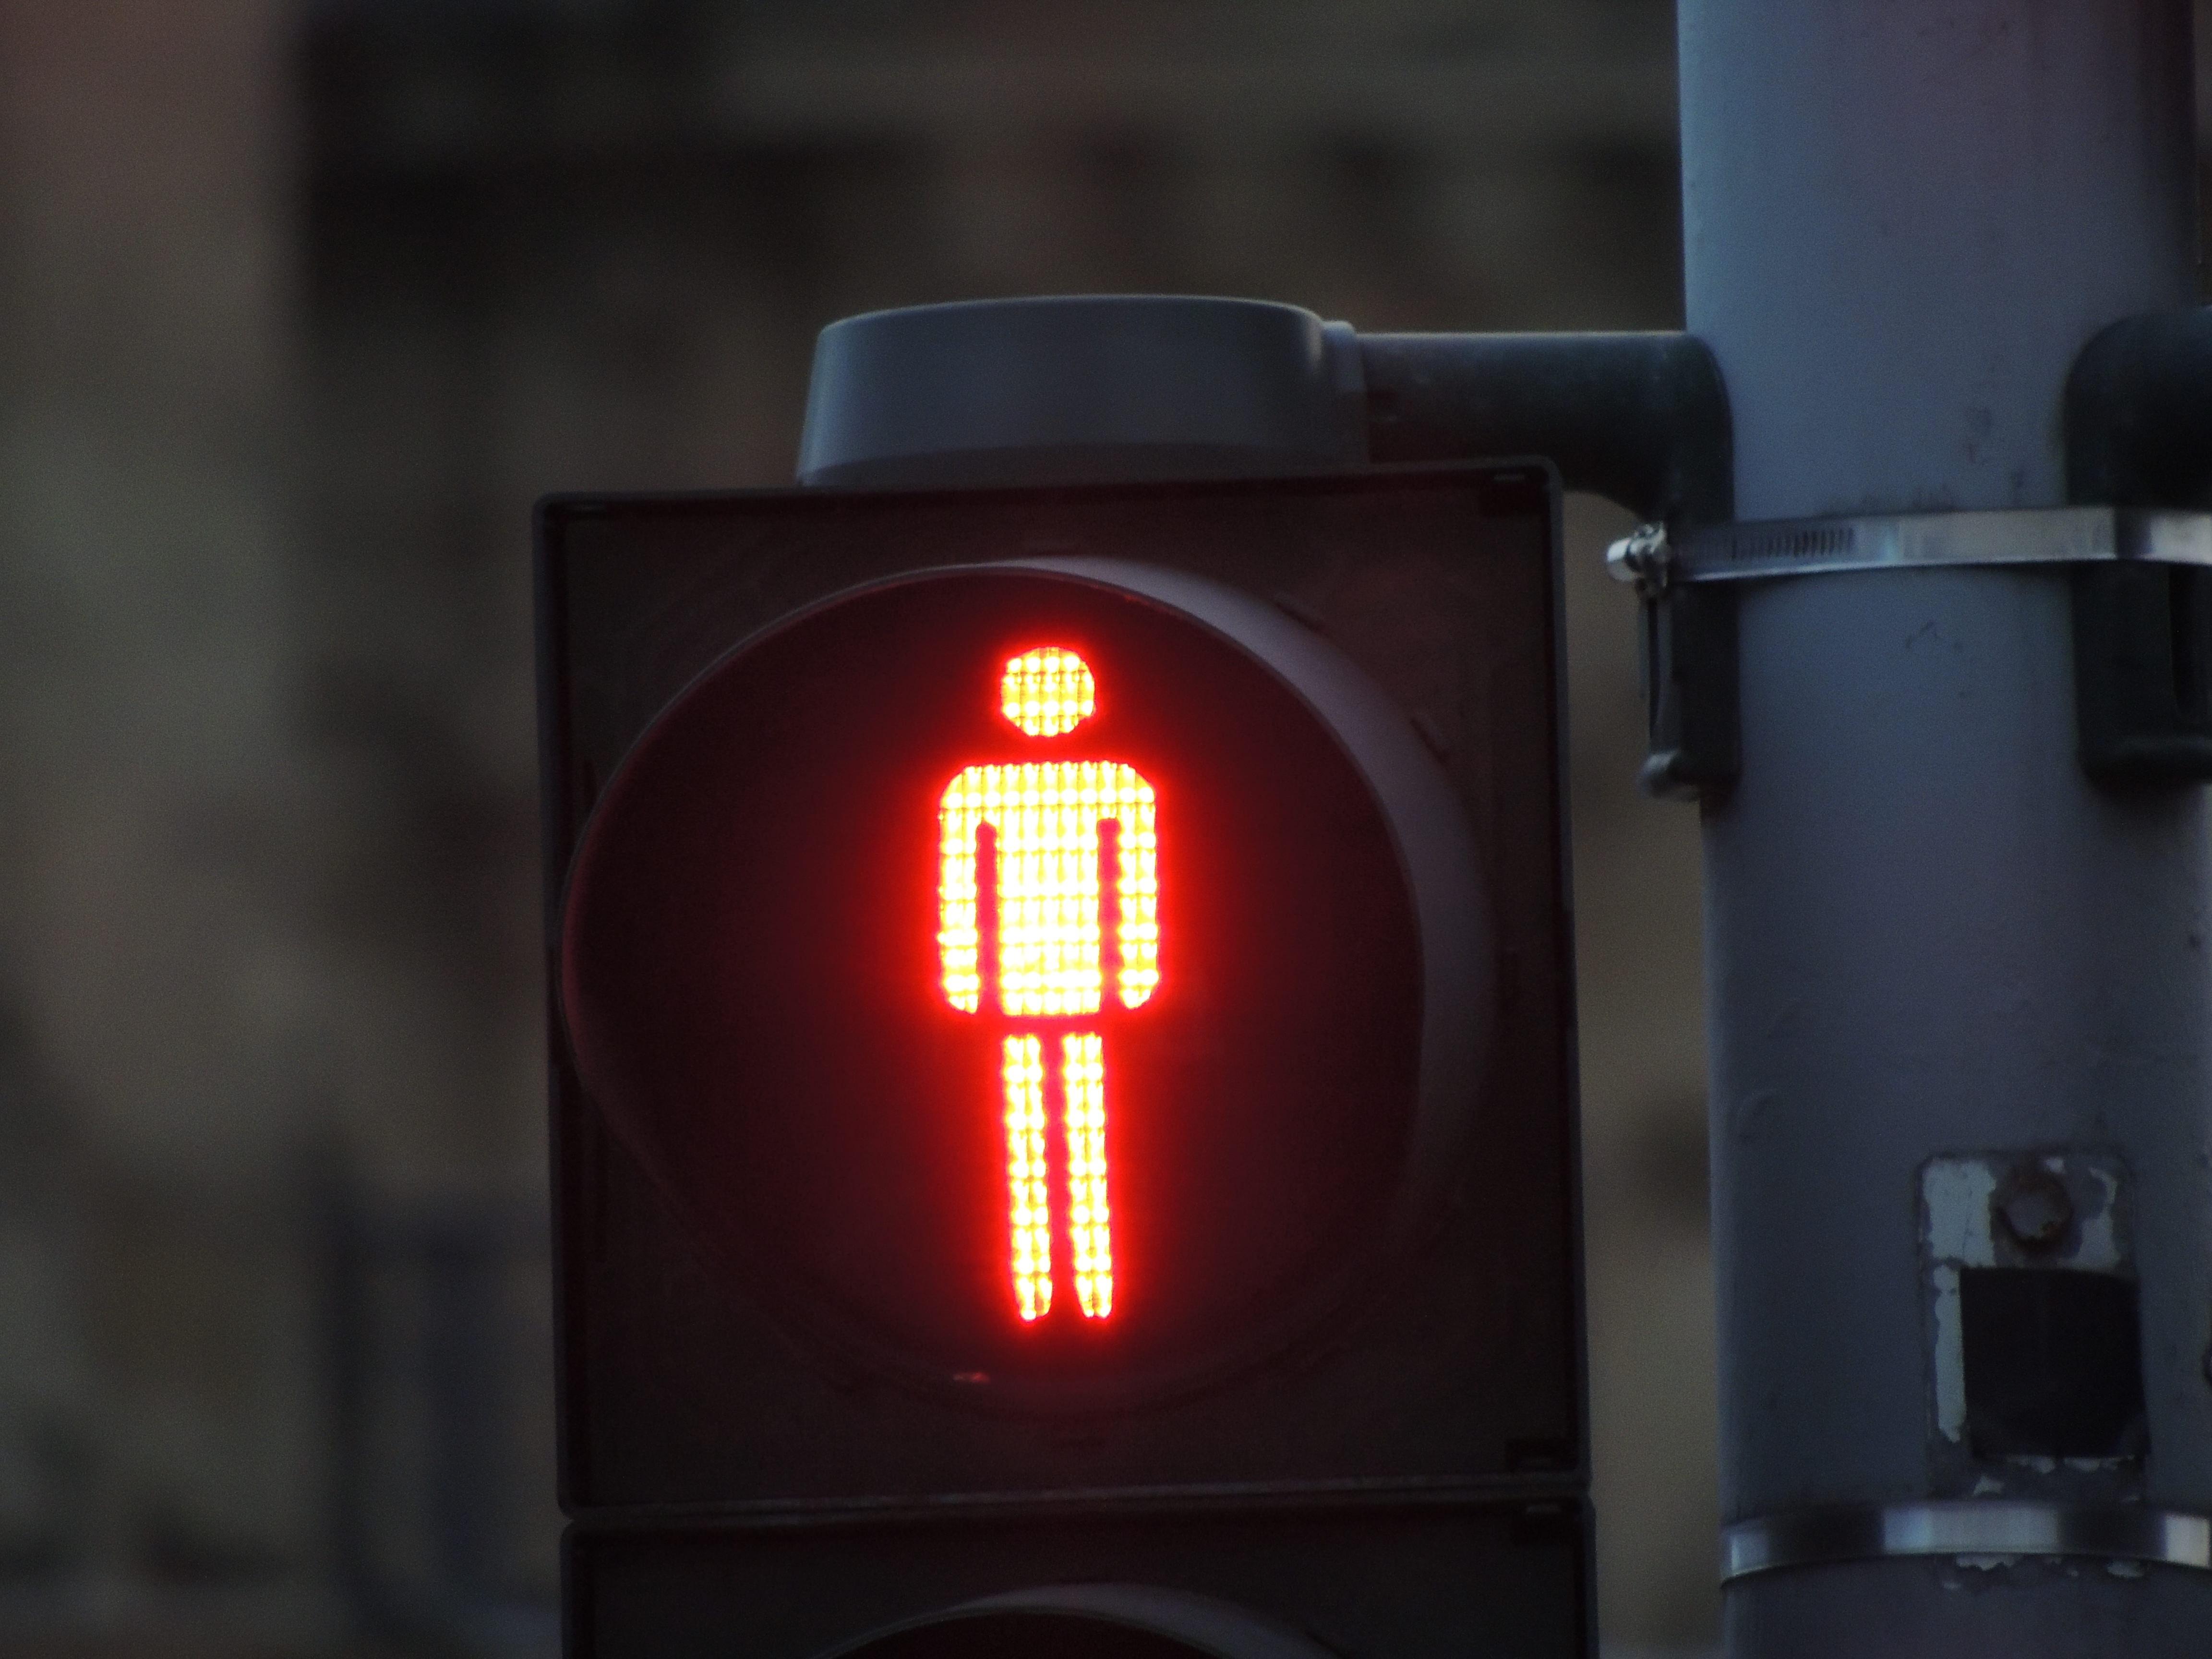 Free Images : color, darkness, signage, lighting, traffic light ...